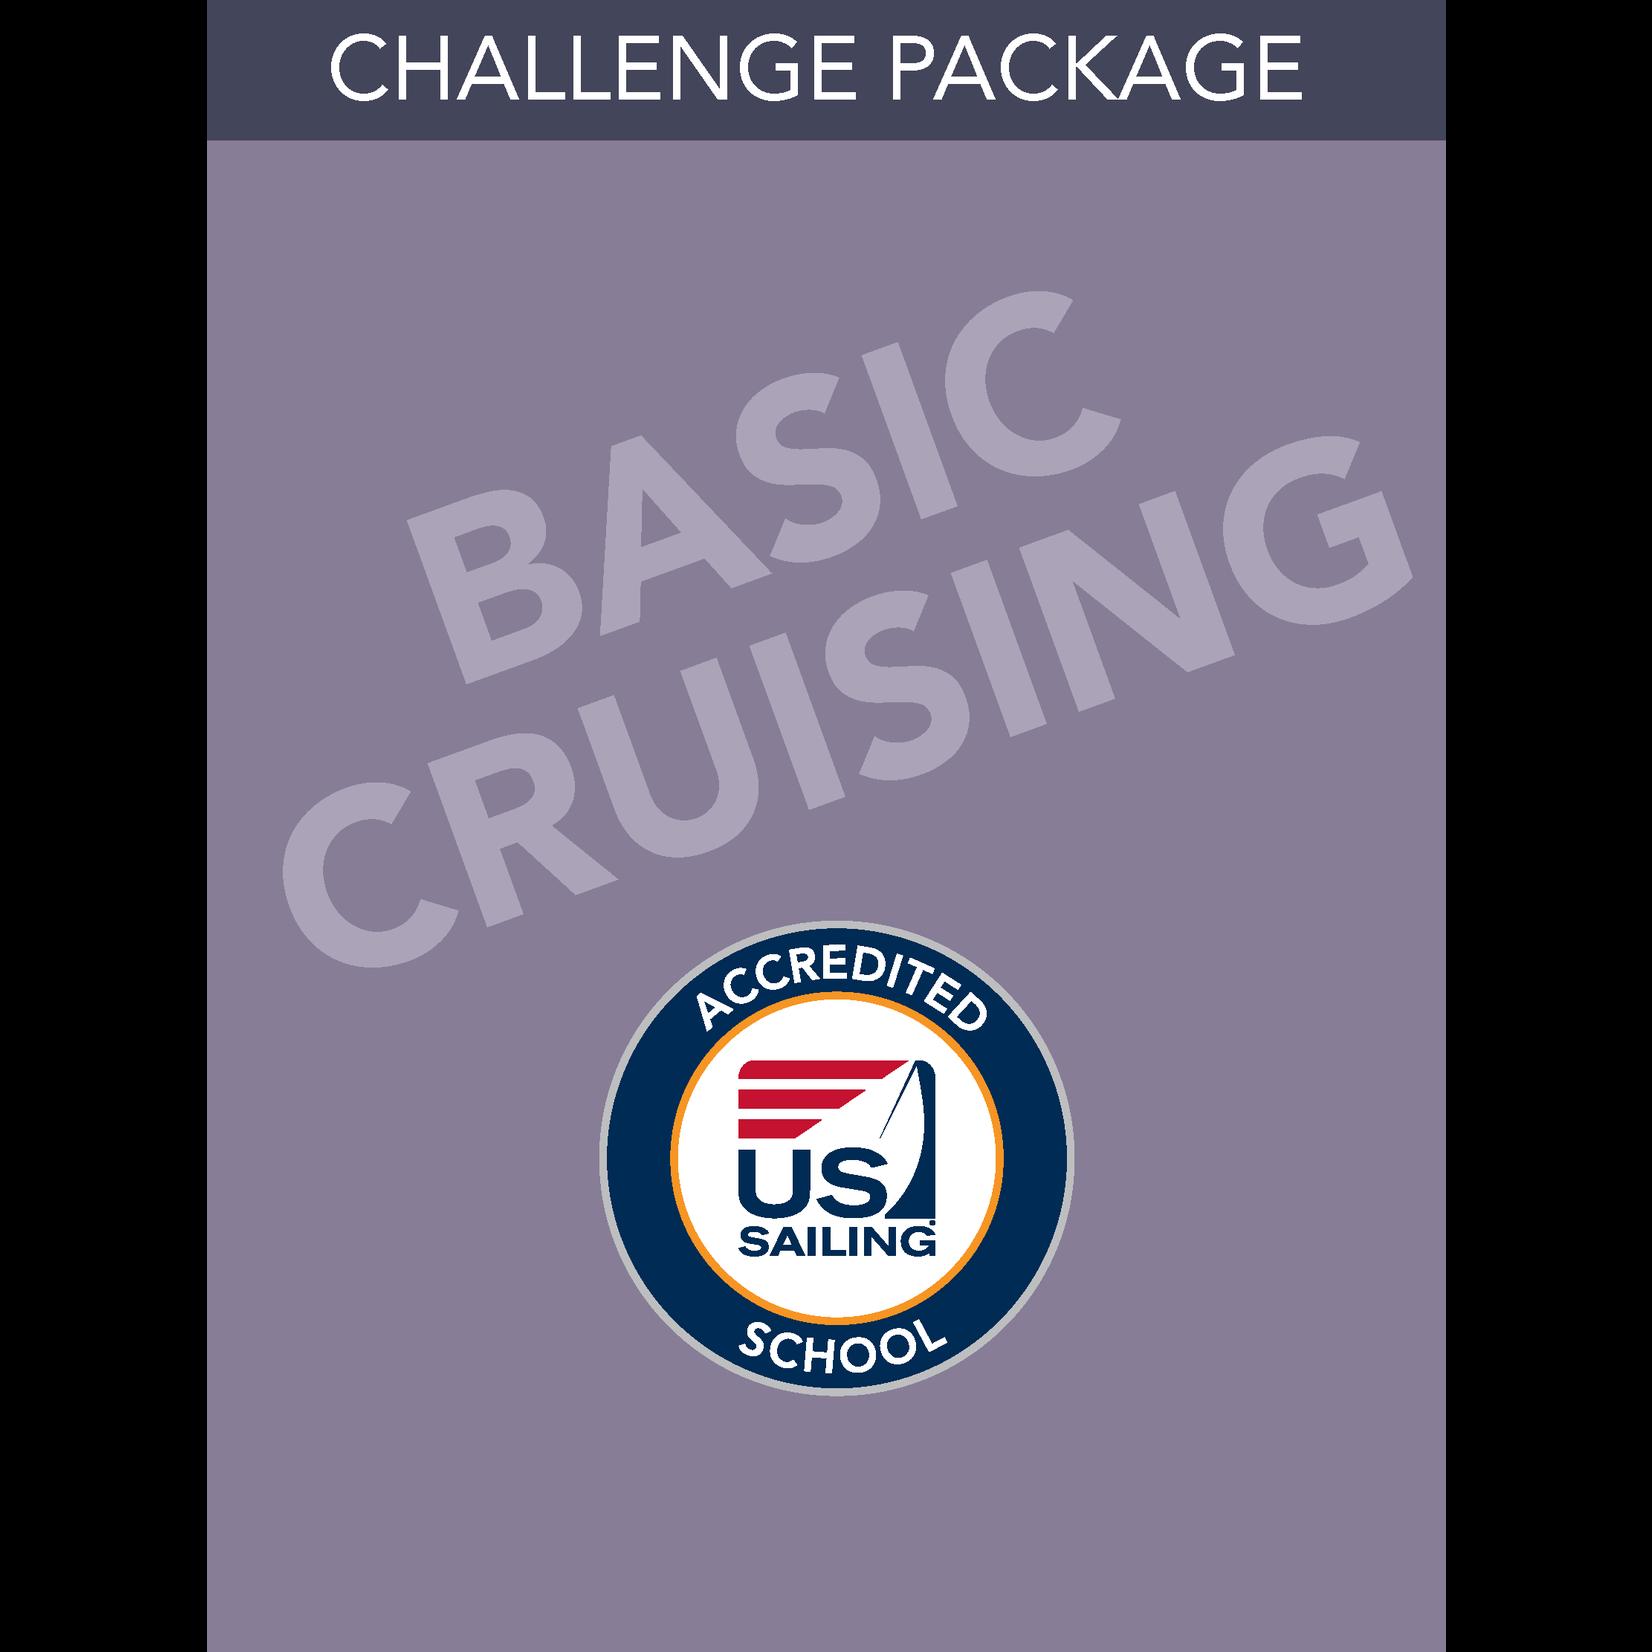 Basic Cruising- Challenge Package